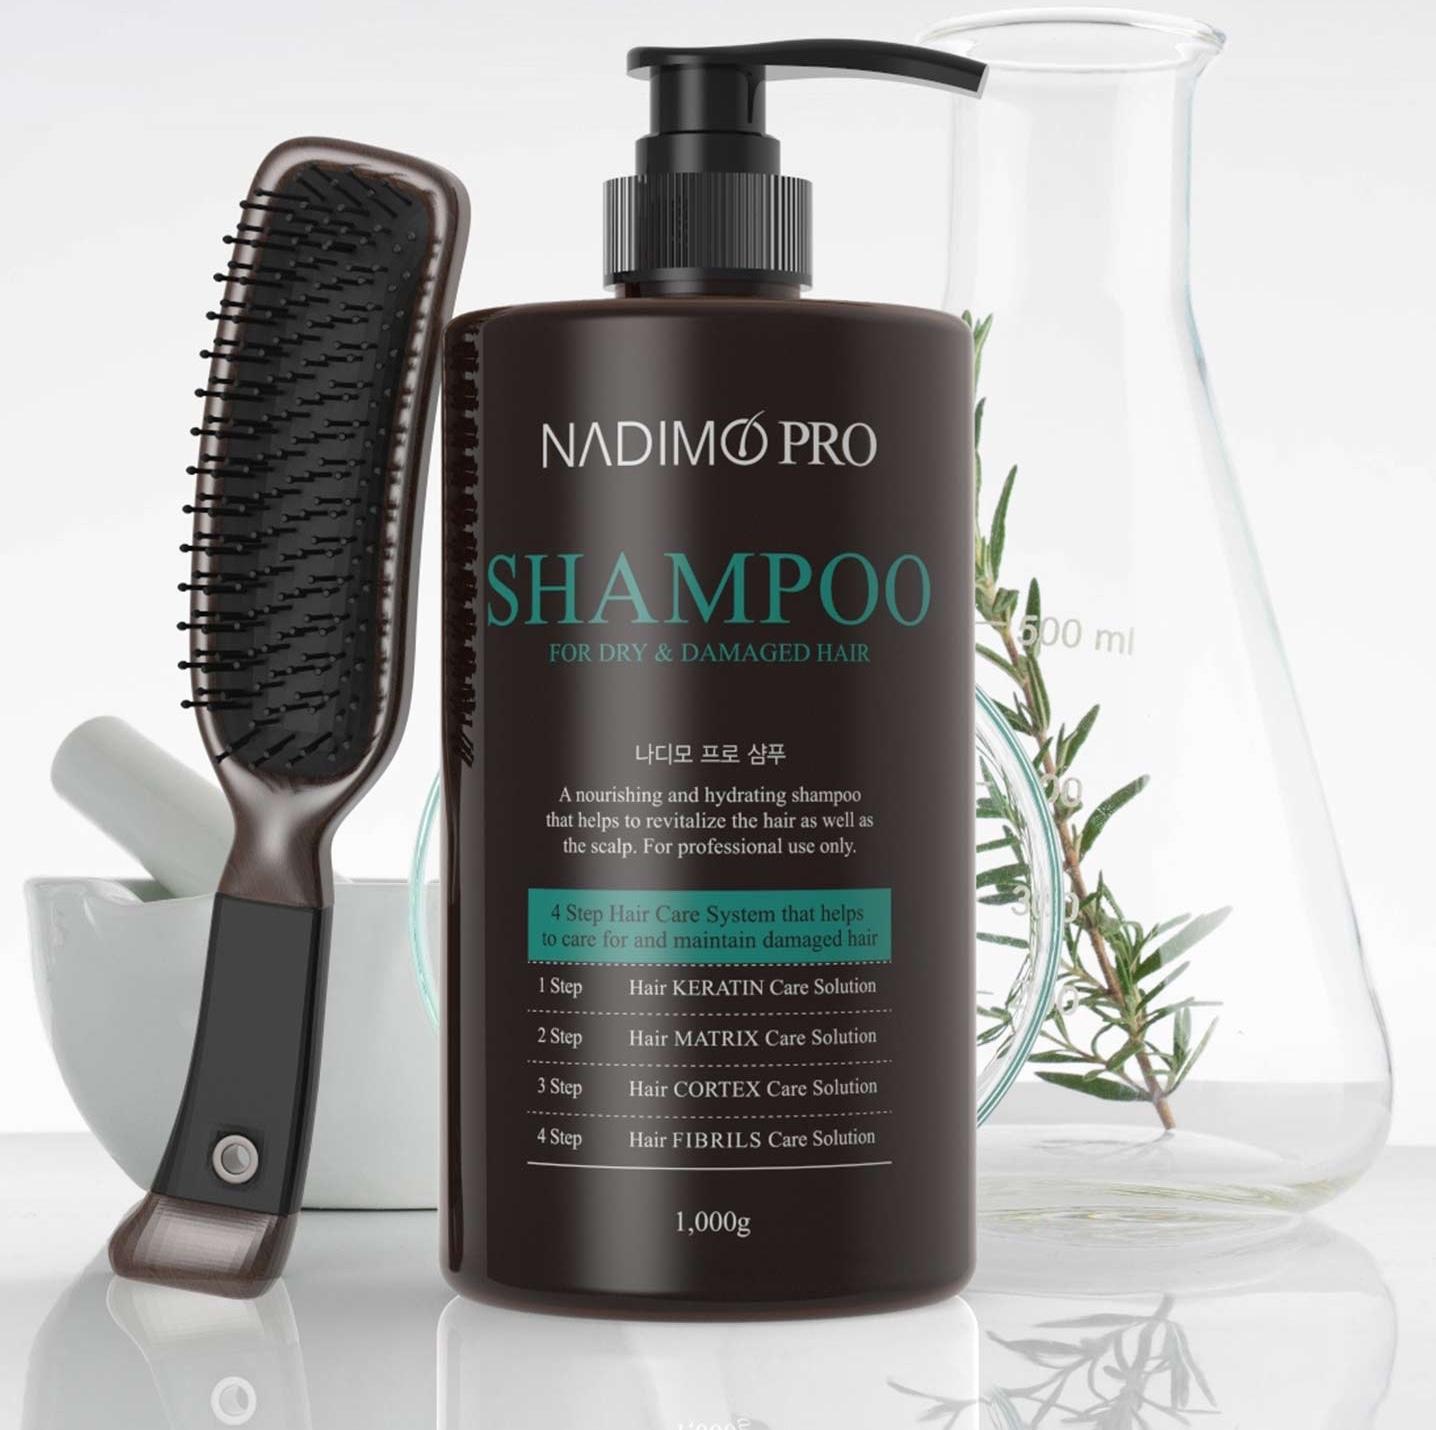 Dầu gội đầu Nadimo Pro Shampoo